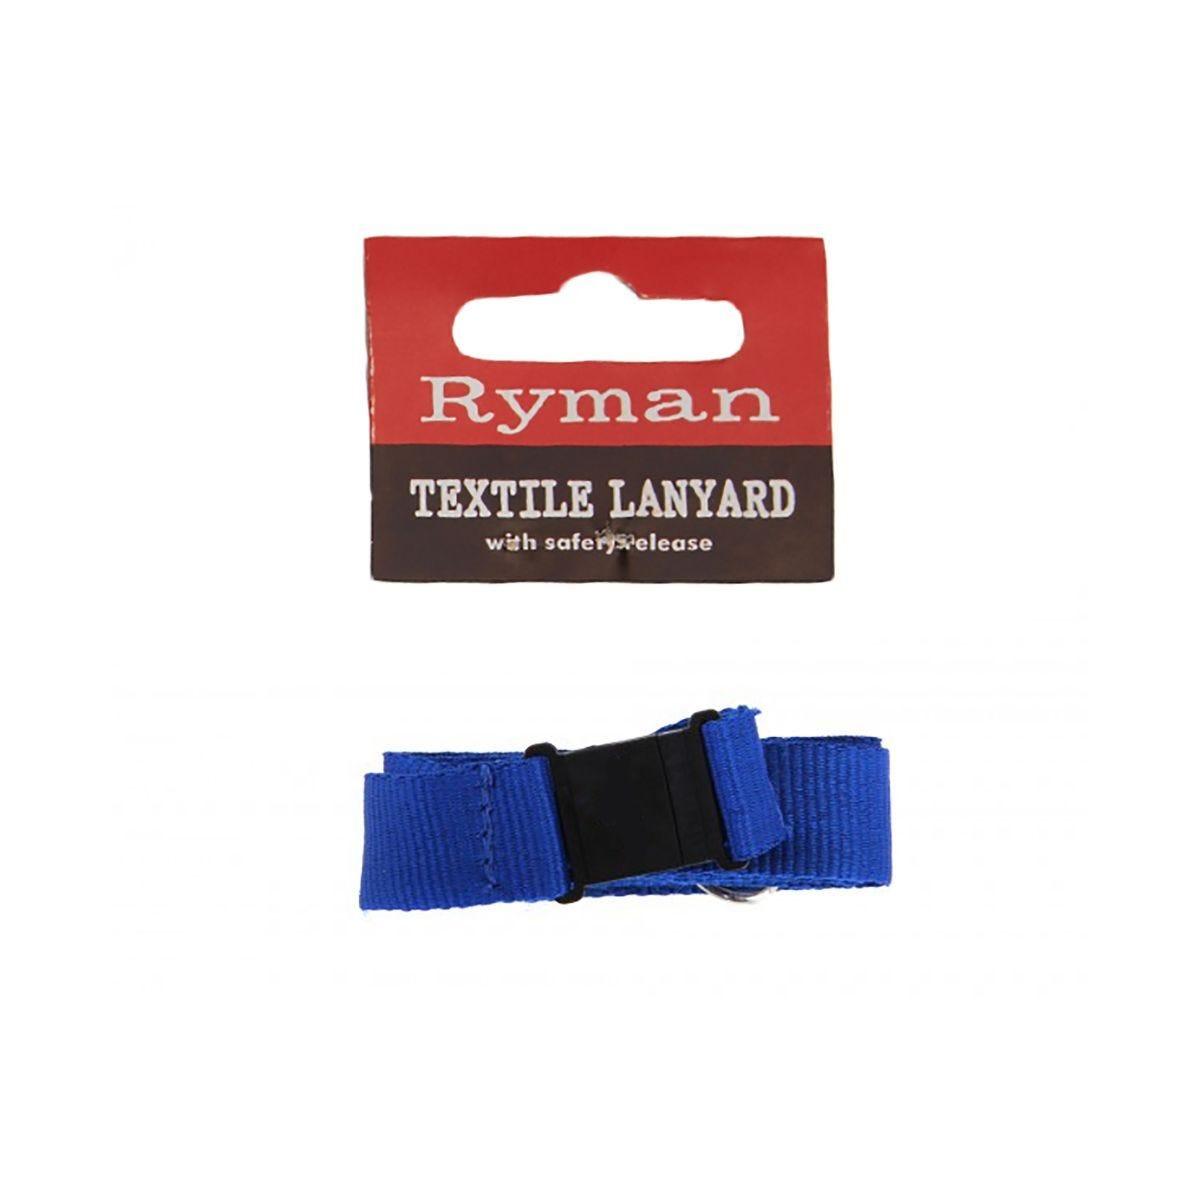 Ryman Textile Lanyard Blue